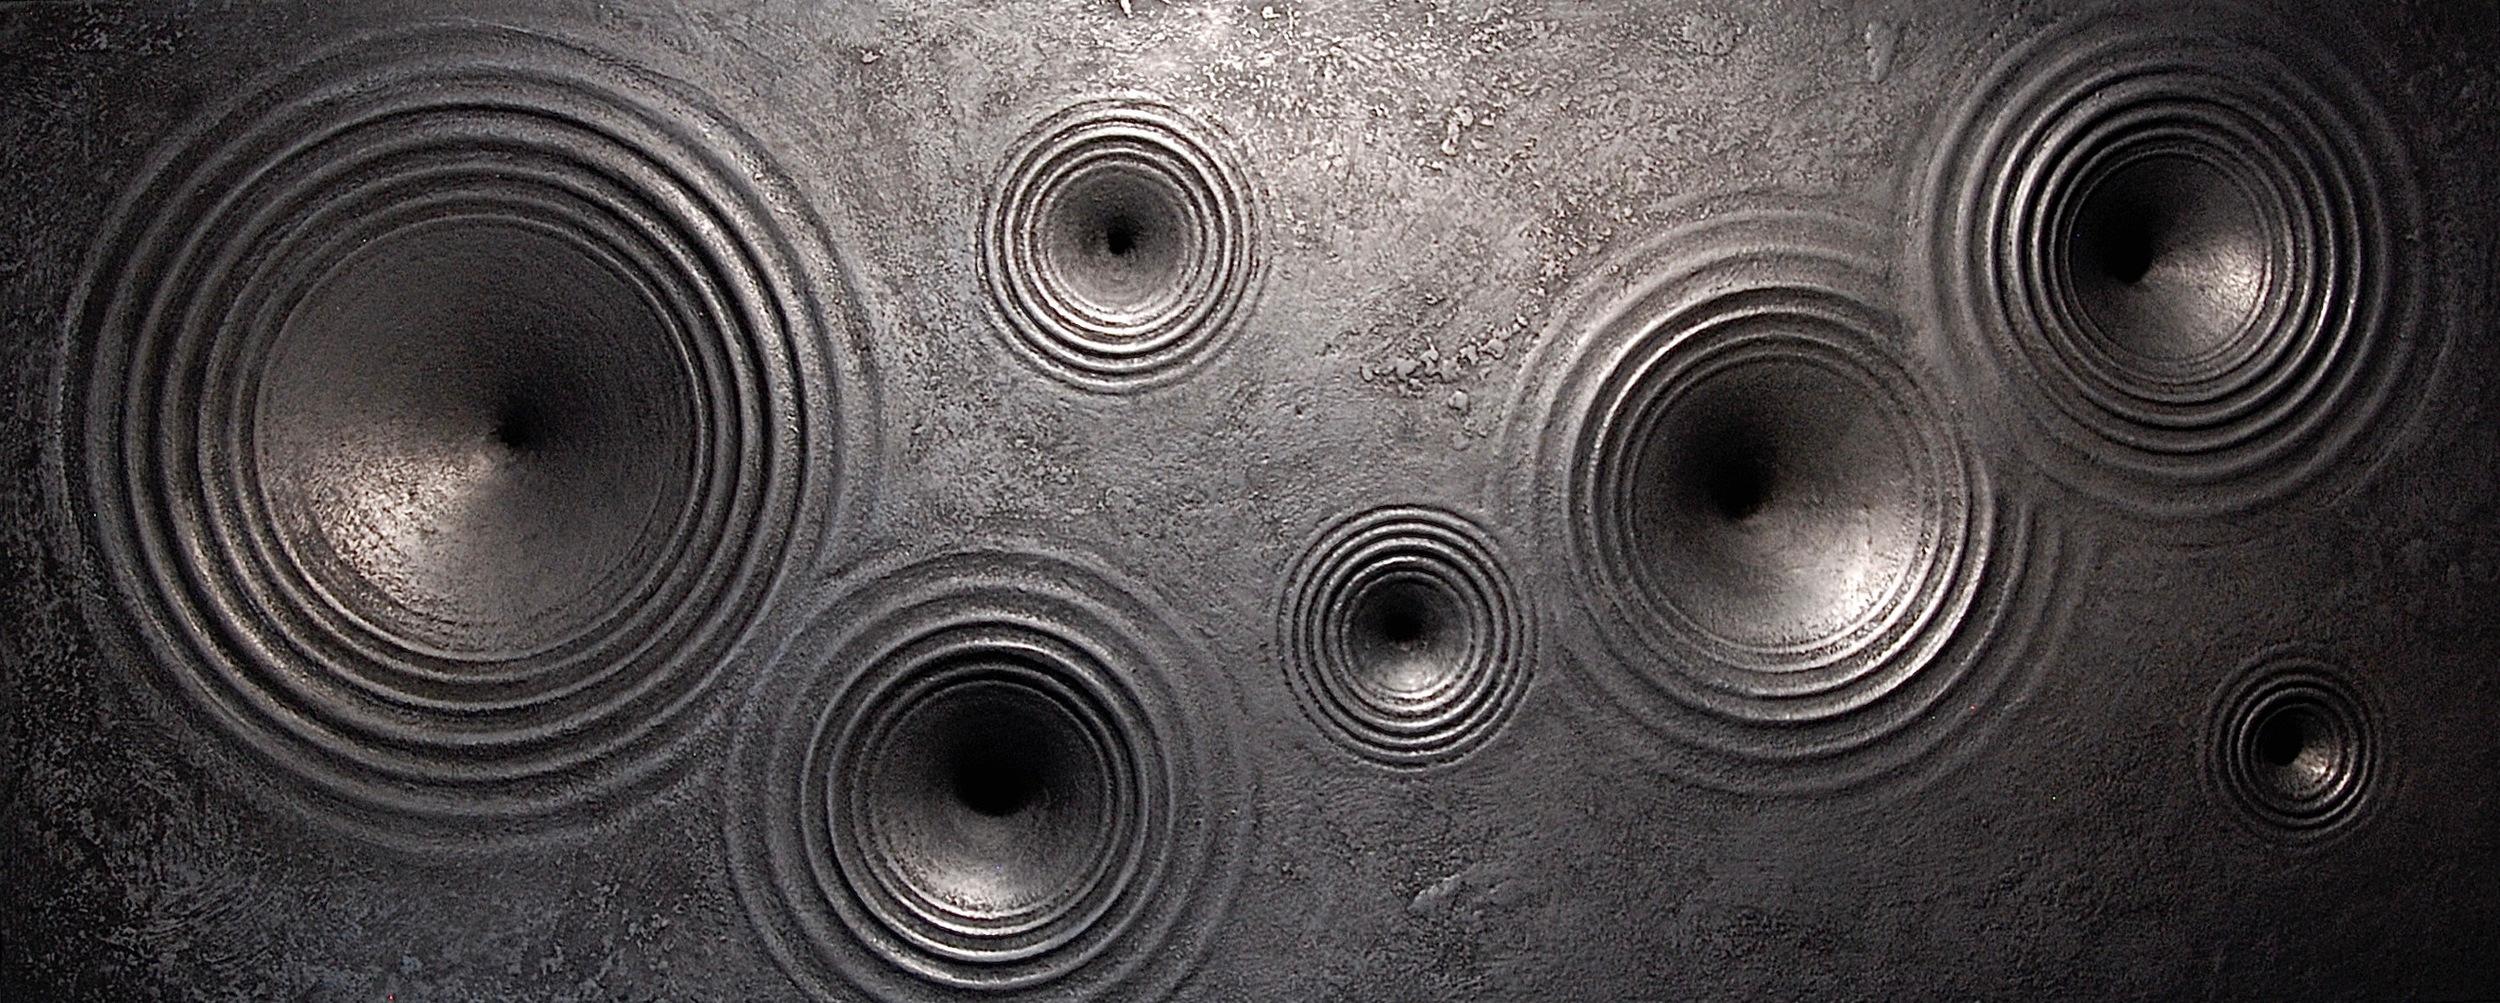 "Thomas Coffin - Vortex (graphite), 14""h x 30""w x 3""d, mixed media sculptural wall relief"